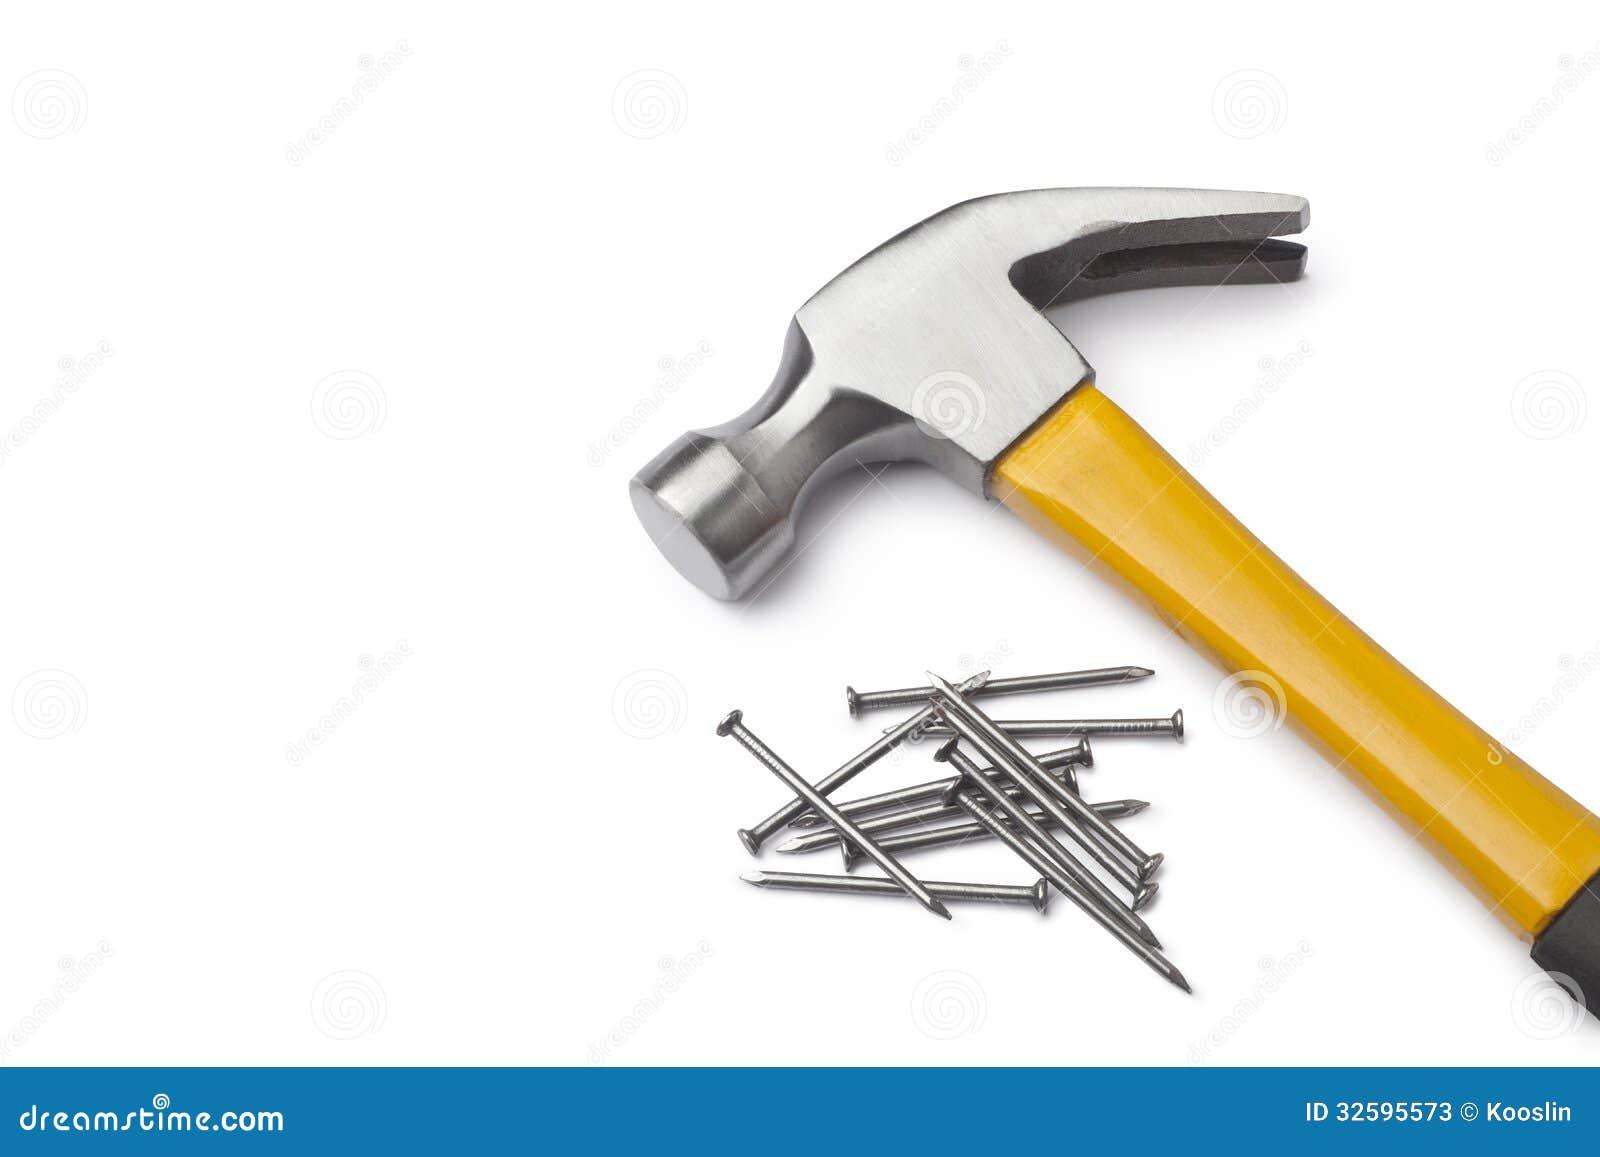 Hammer and nails stock photos image